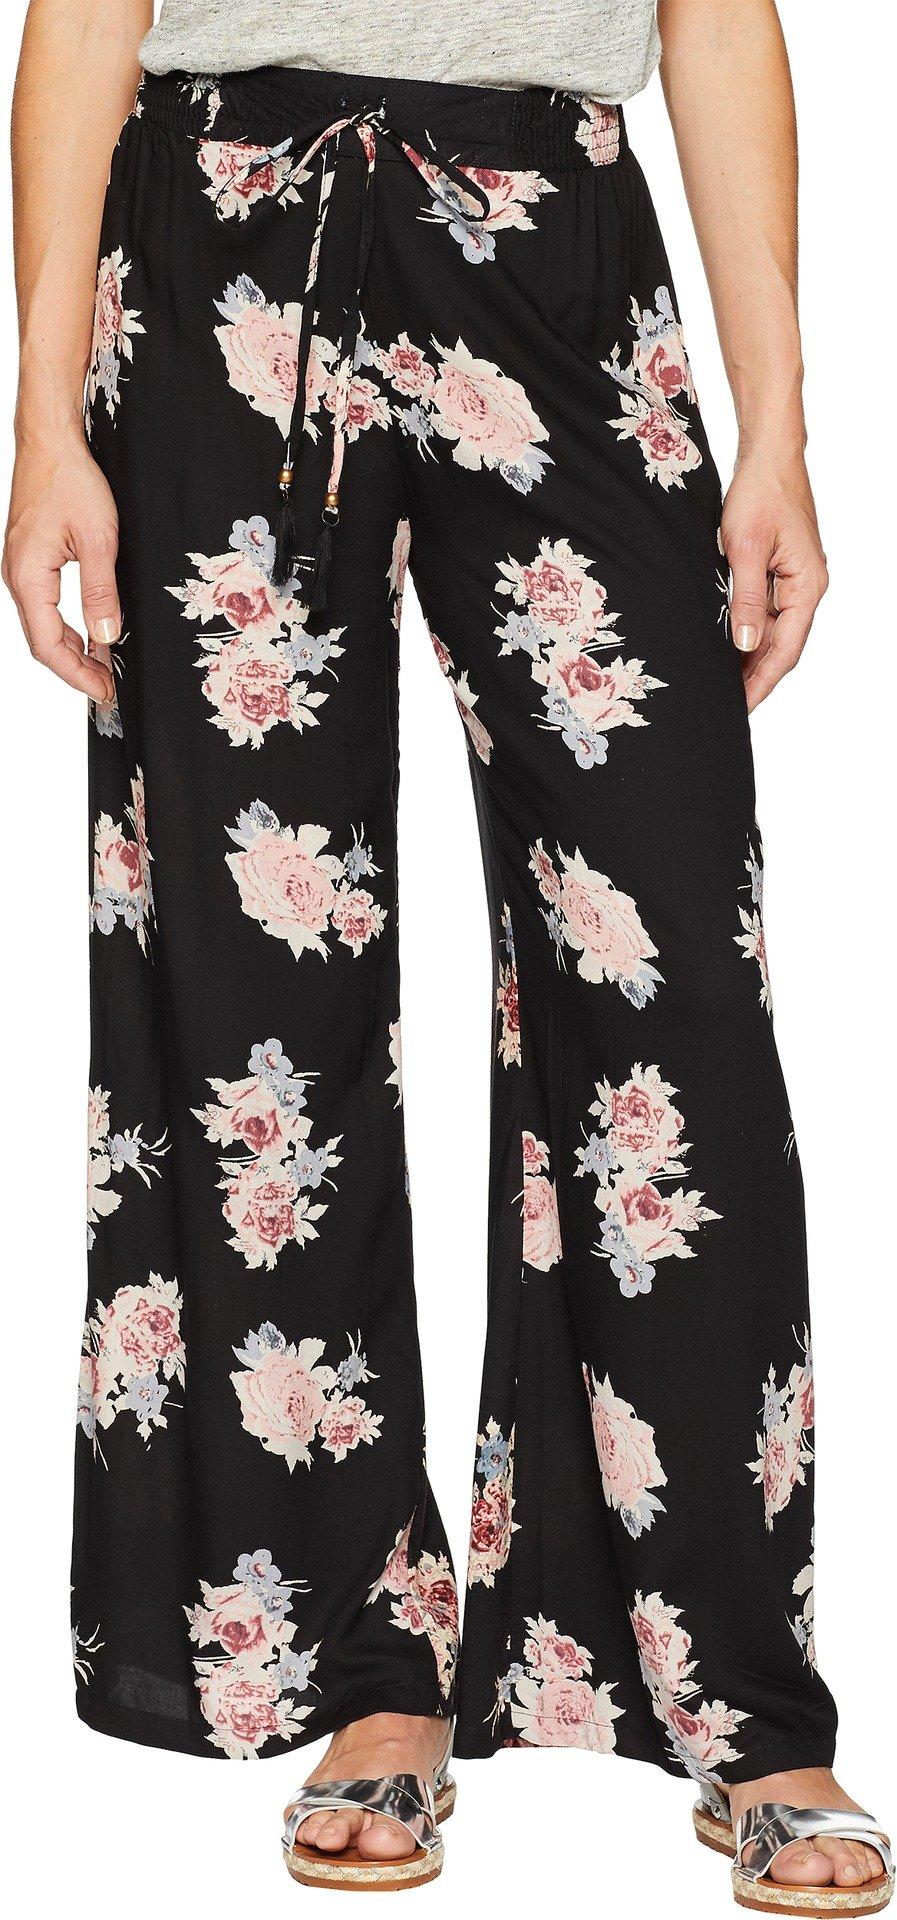 Angie Women's Floral Pants Black Large 30